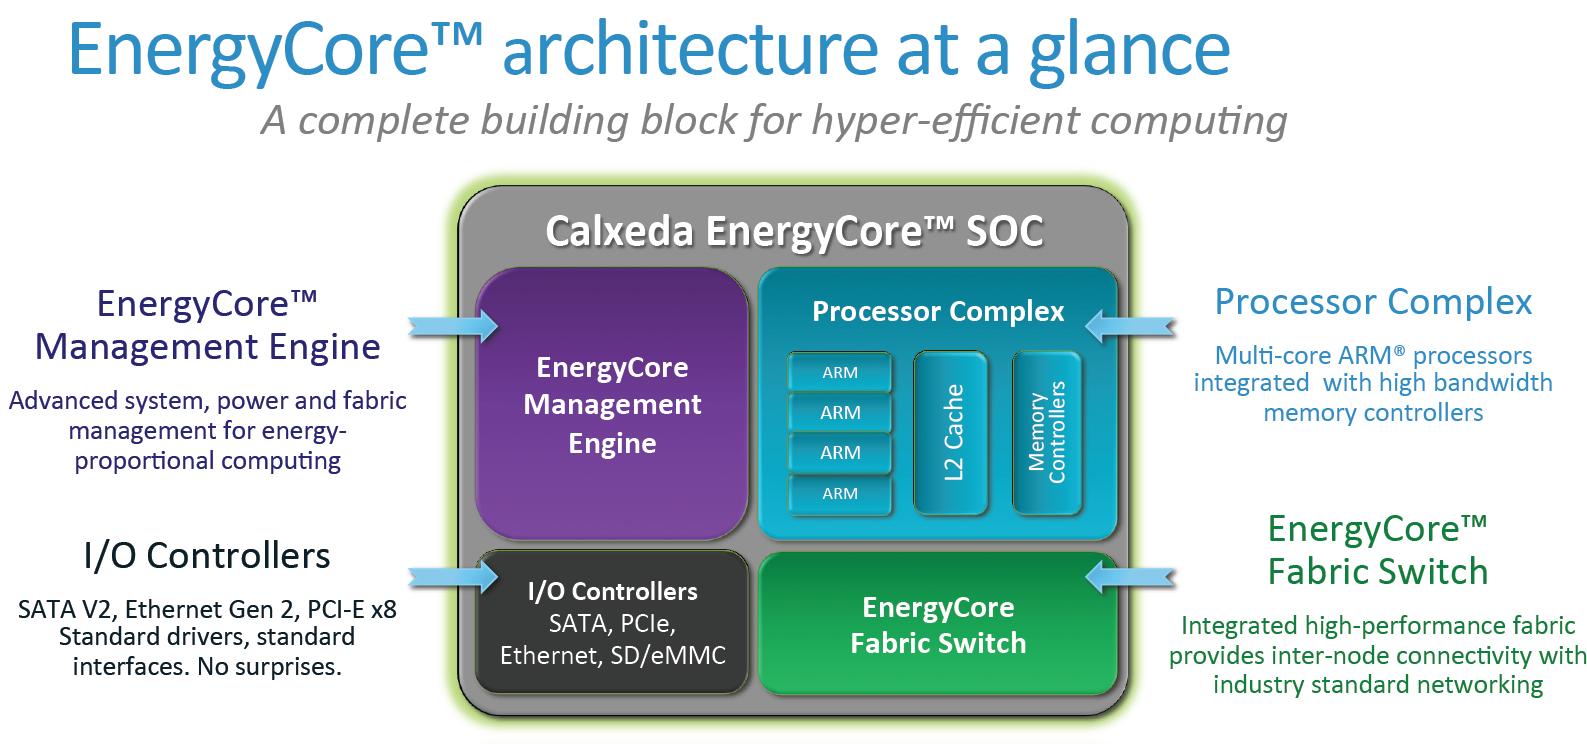 A Closer Look at the Server Node - Calxeda\'s ARM server tested